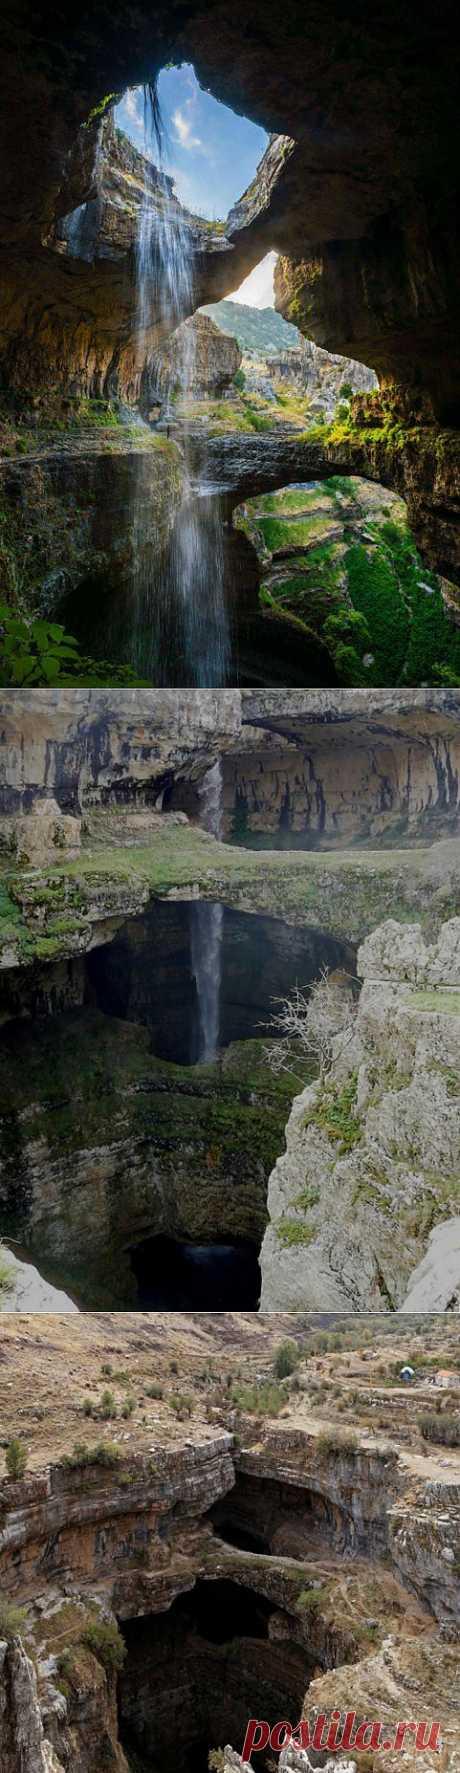 (+1) тема - Фантастический водопад Баатара в Ливане | ТУРИЗМ И ОТДЫХ